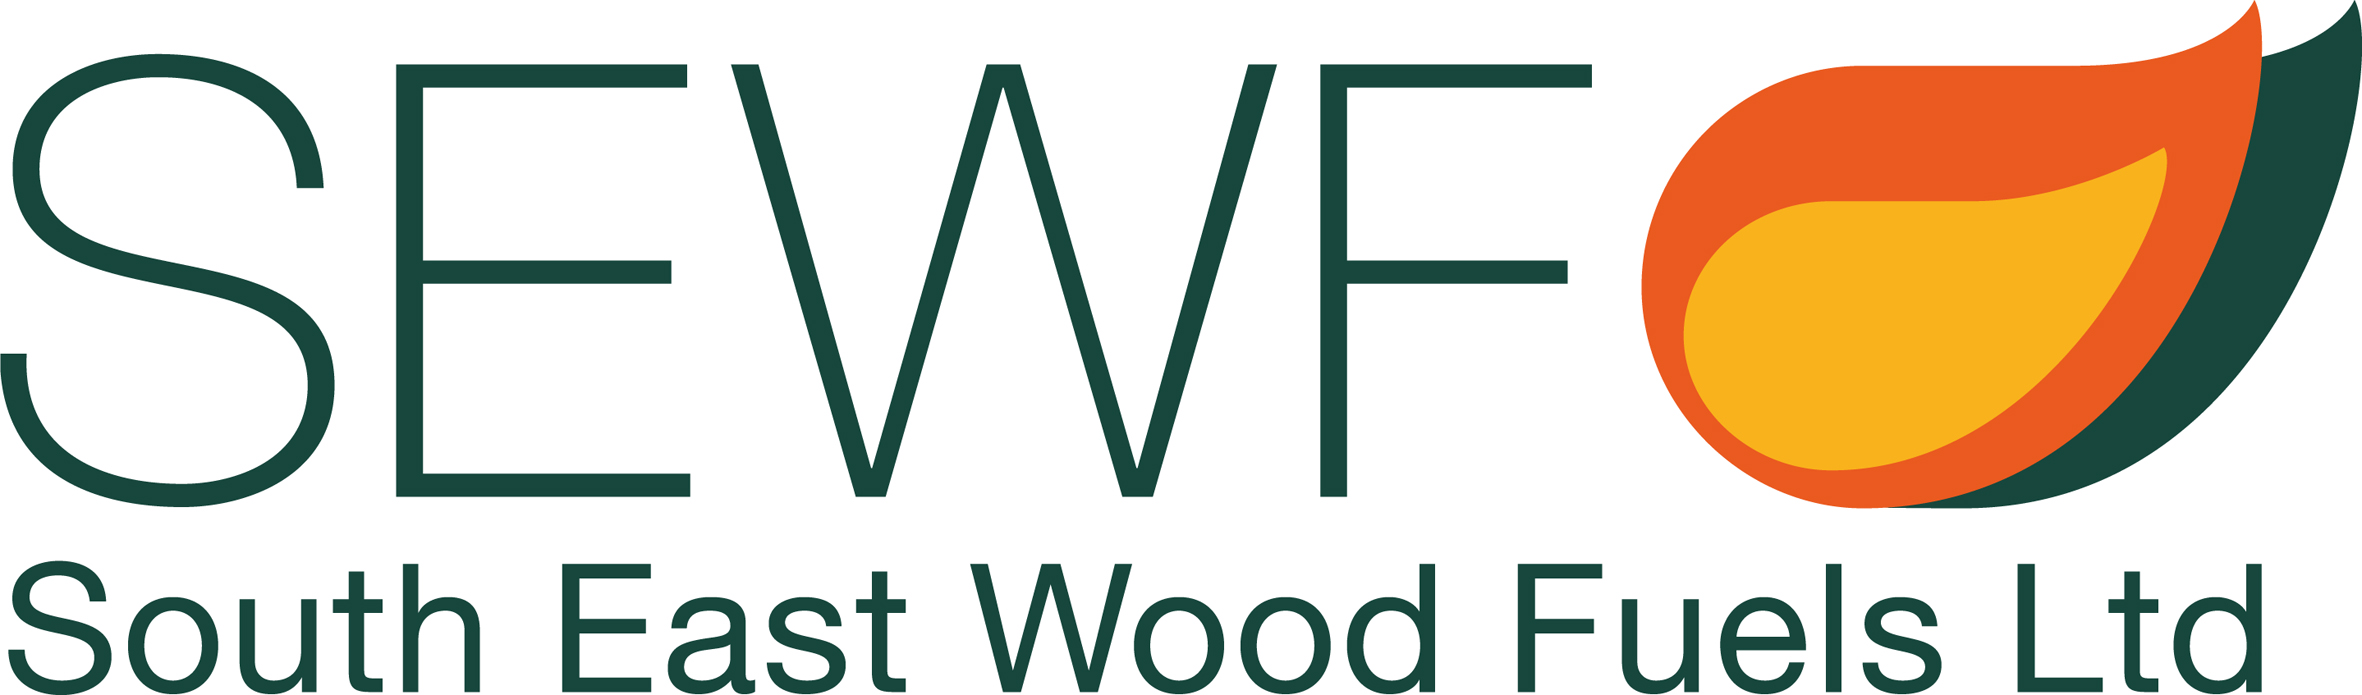 SEWF logo